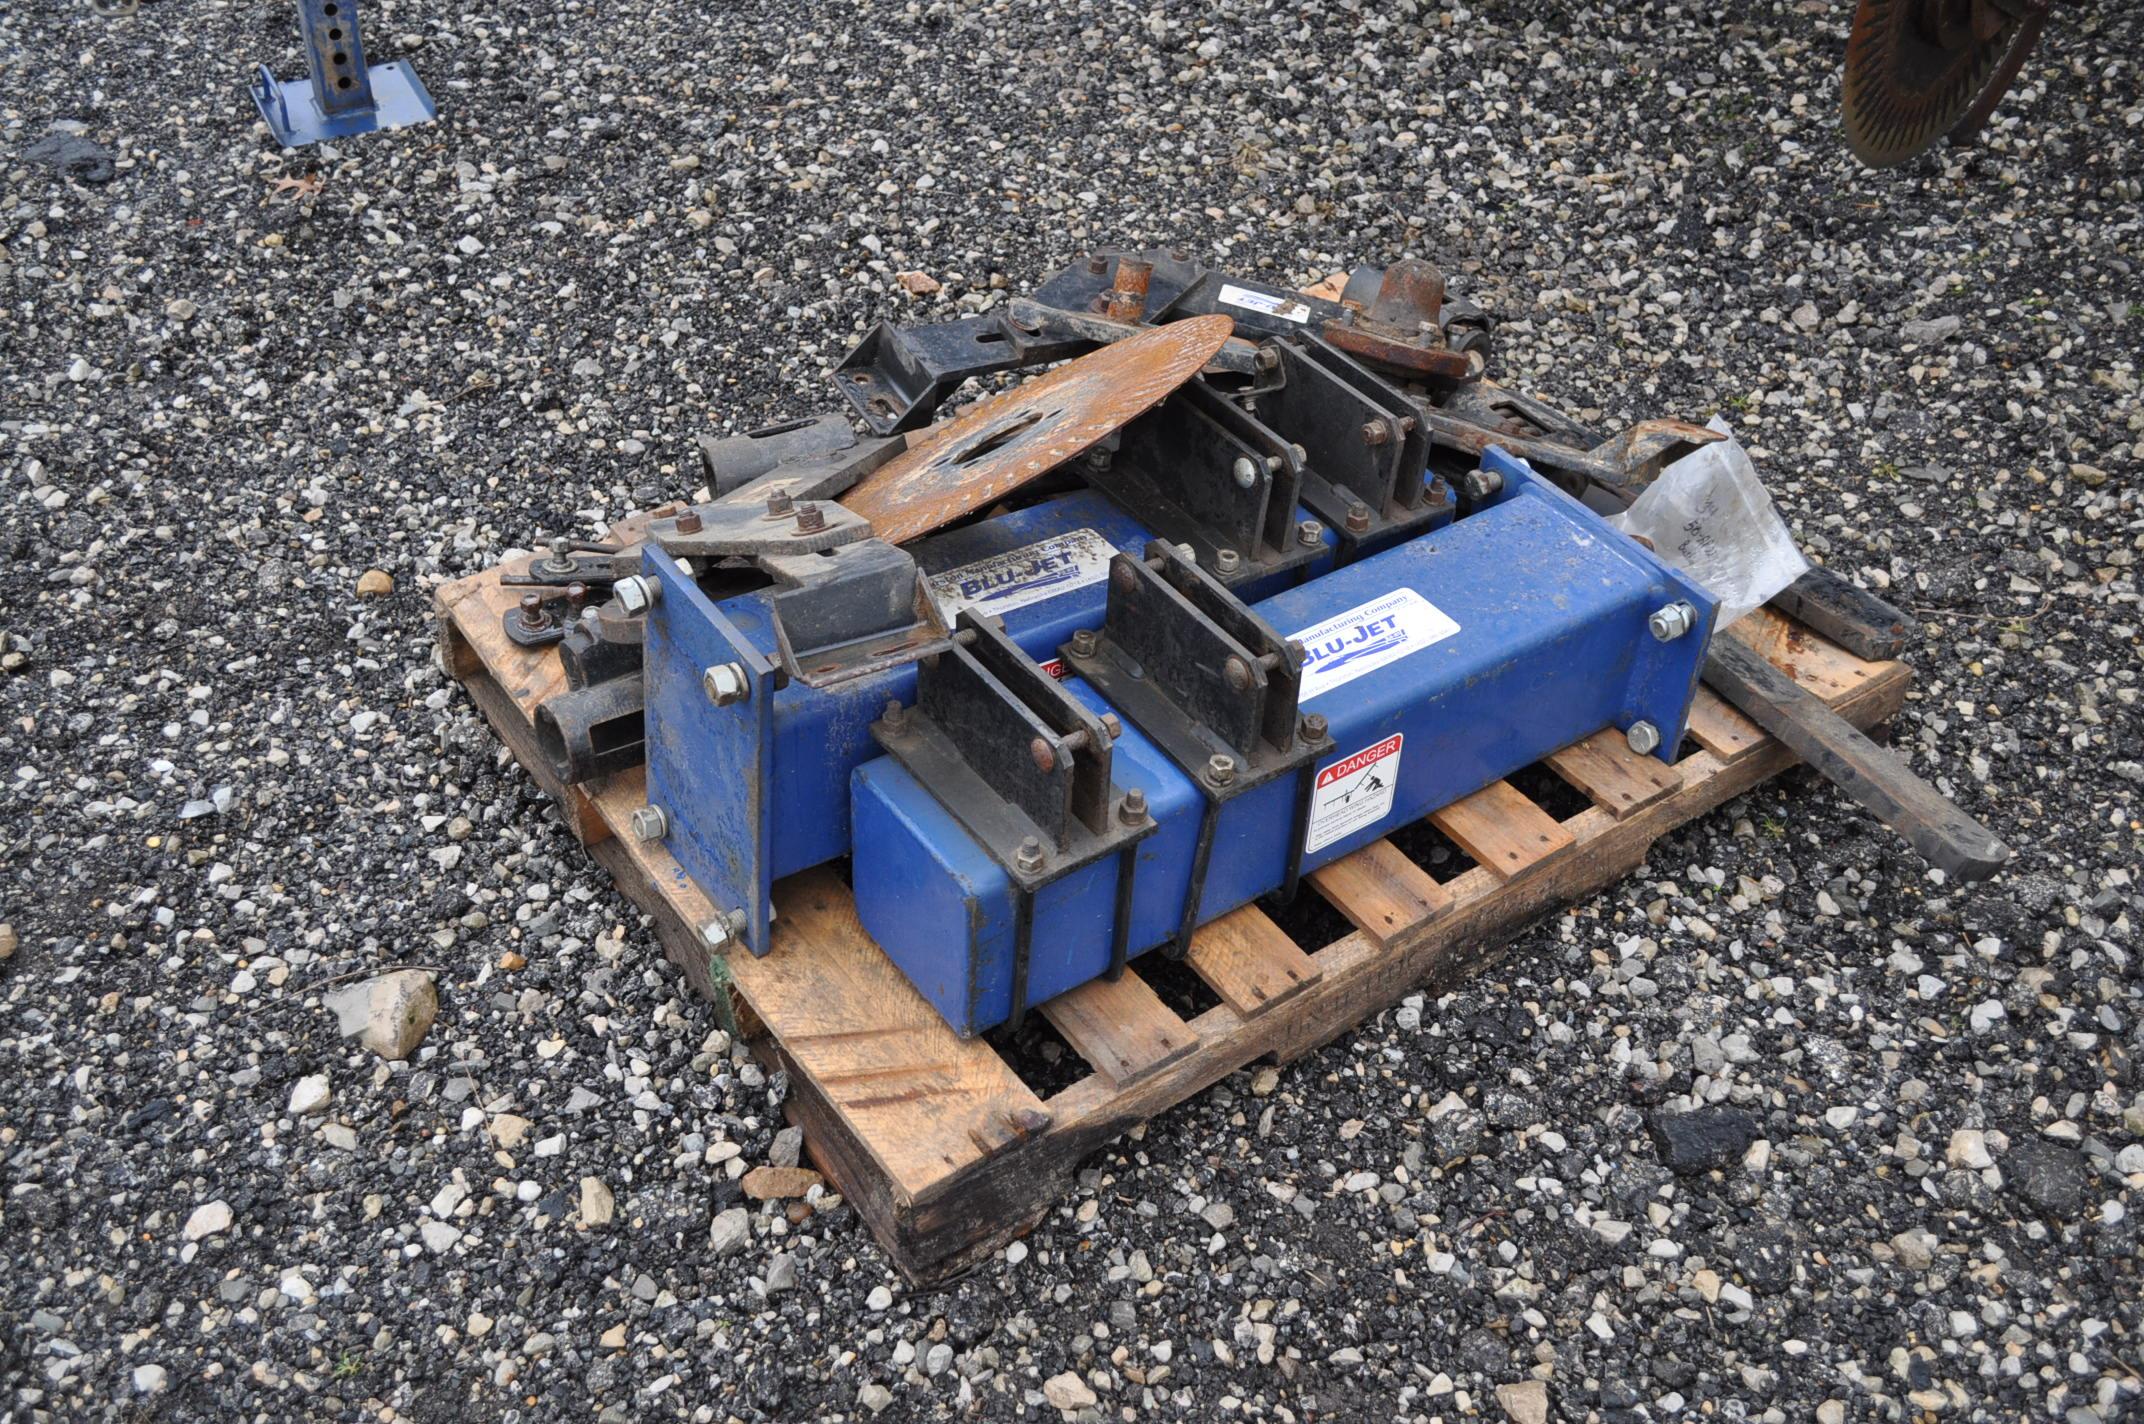 Blu-Jet AT 4010 28% applicator, 12/16 row, 1200 gal poly tank, 320/90R46 tires, hyd drive pump, - Image 12 of 12